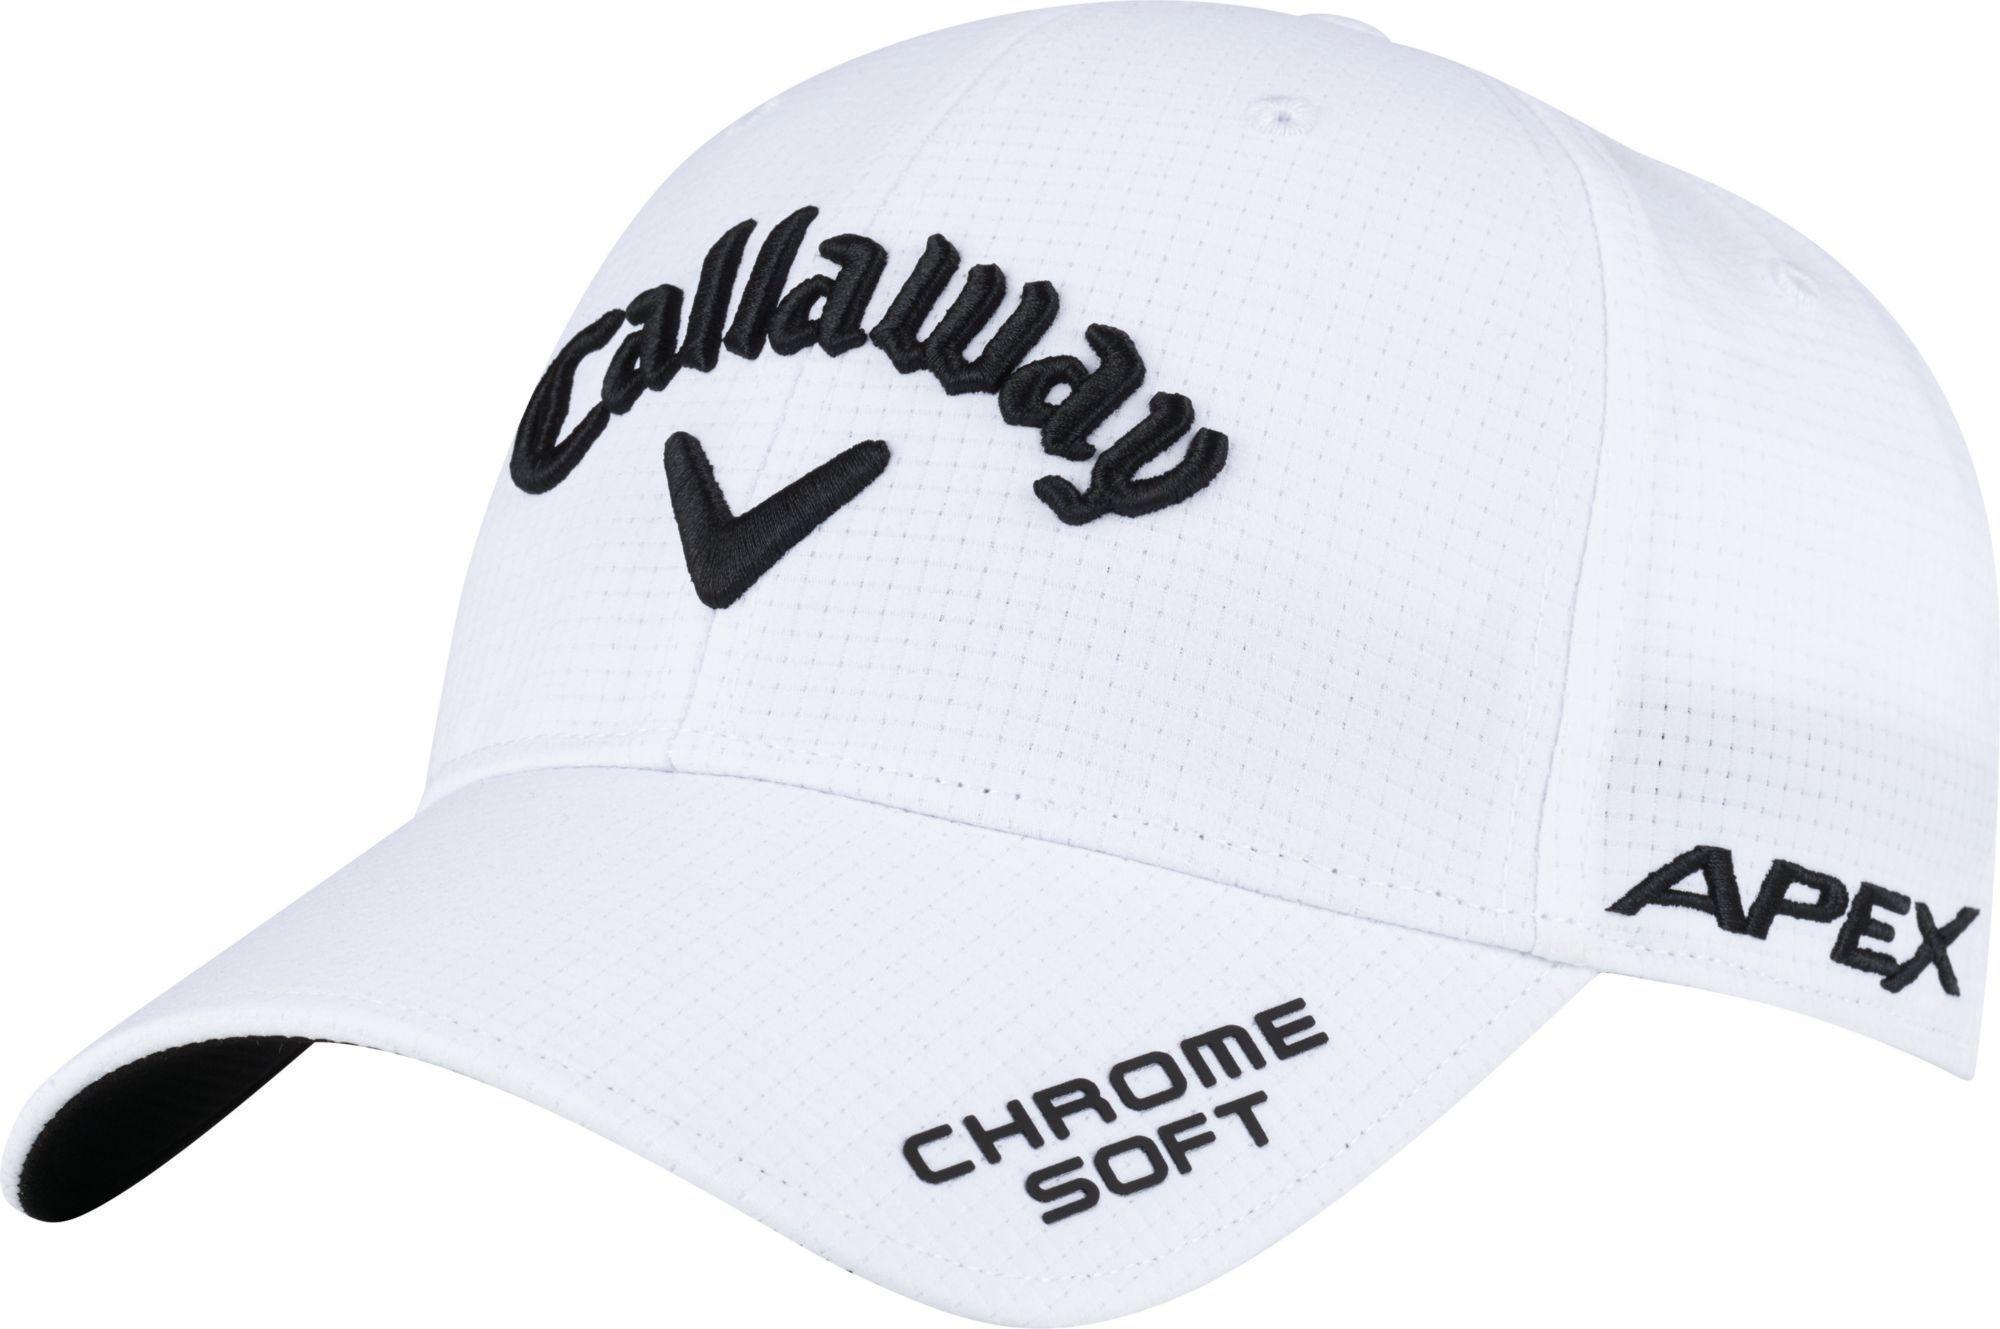 e8c5d10e749 Callaway Men's 2019 TA Performance Pro Golf Hat, Black in 2019 ...